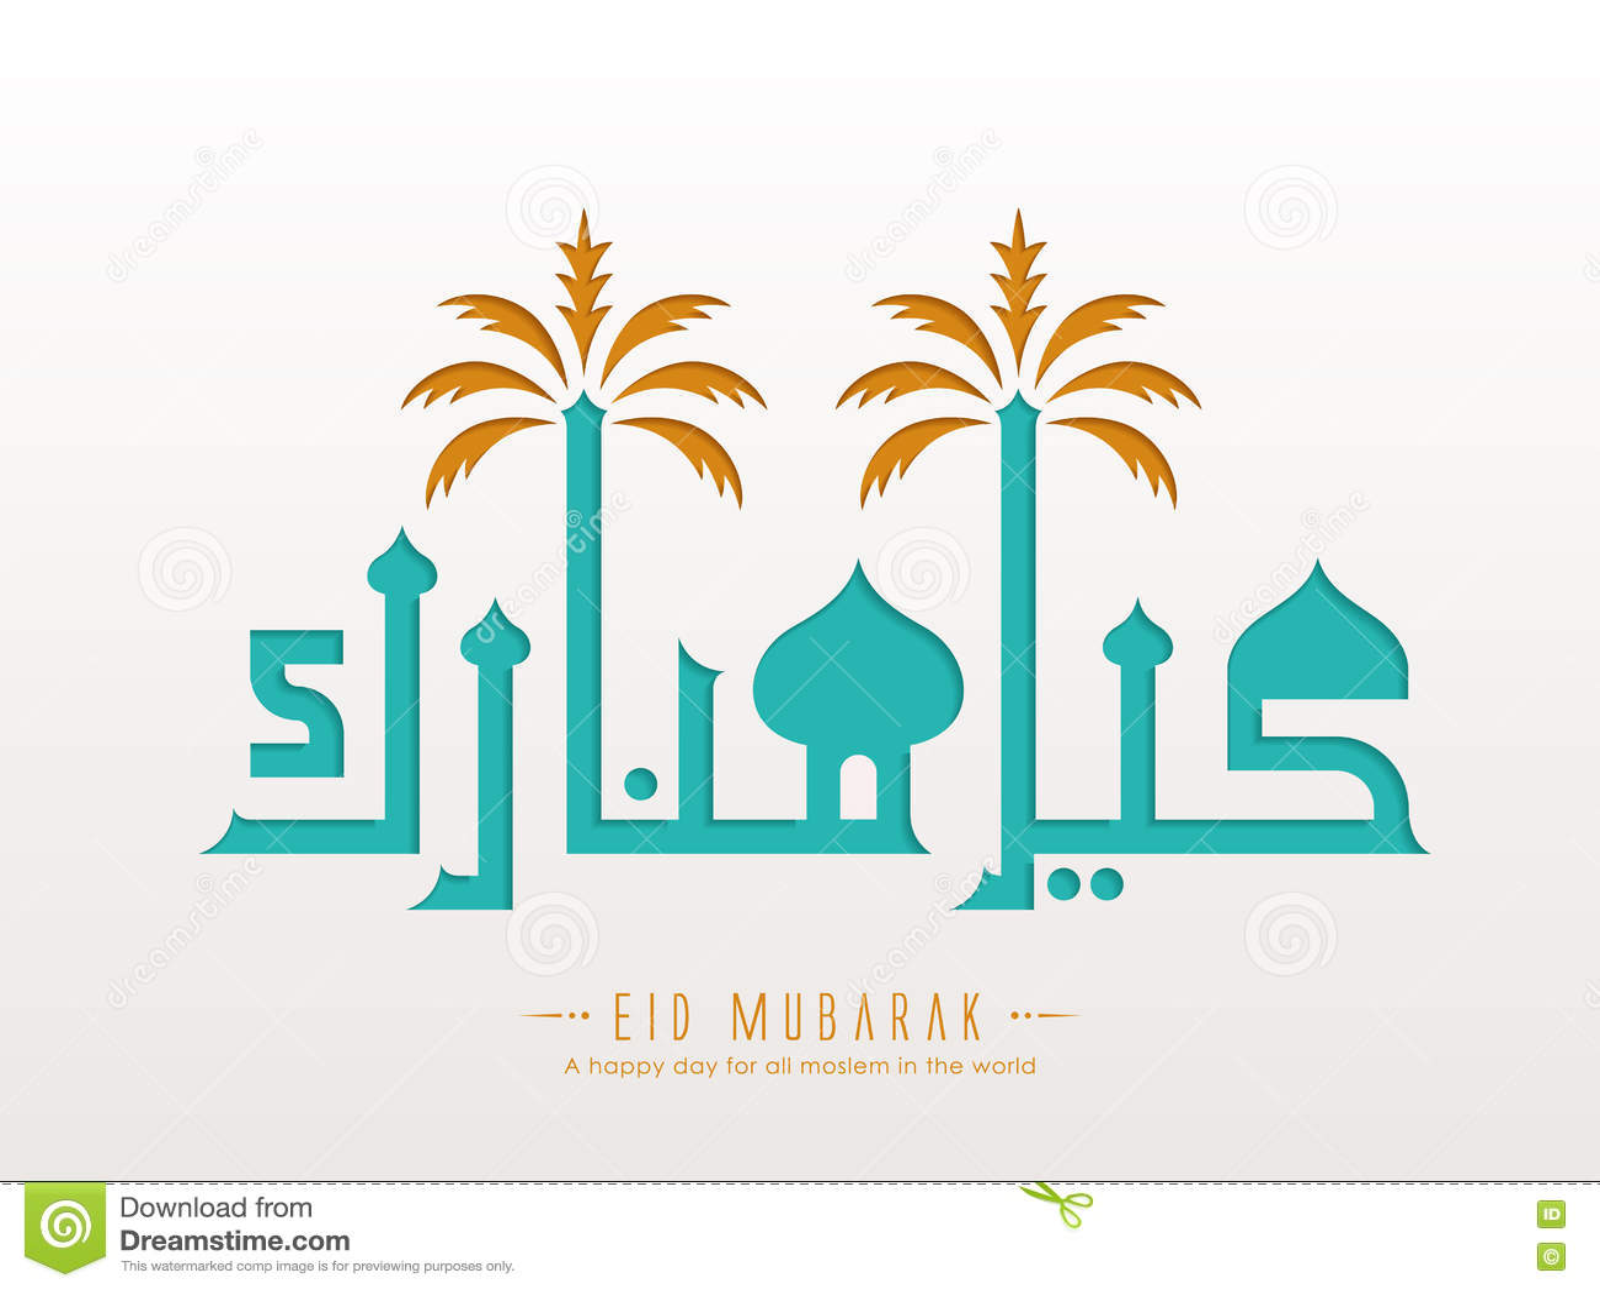 Eid mubarak calligraphy design stock vector illustration of allahu eid mubarak calligraphy design kristyandbryce Image collections